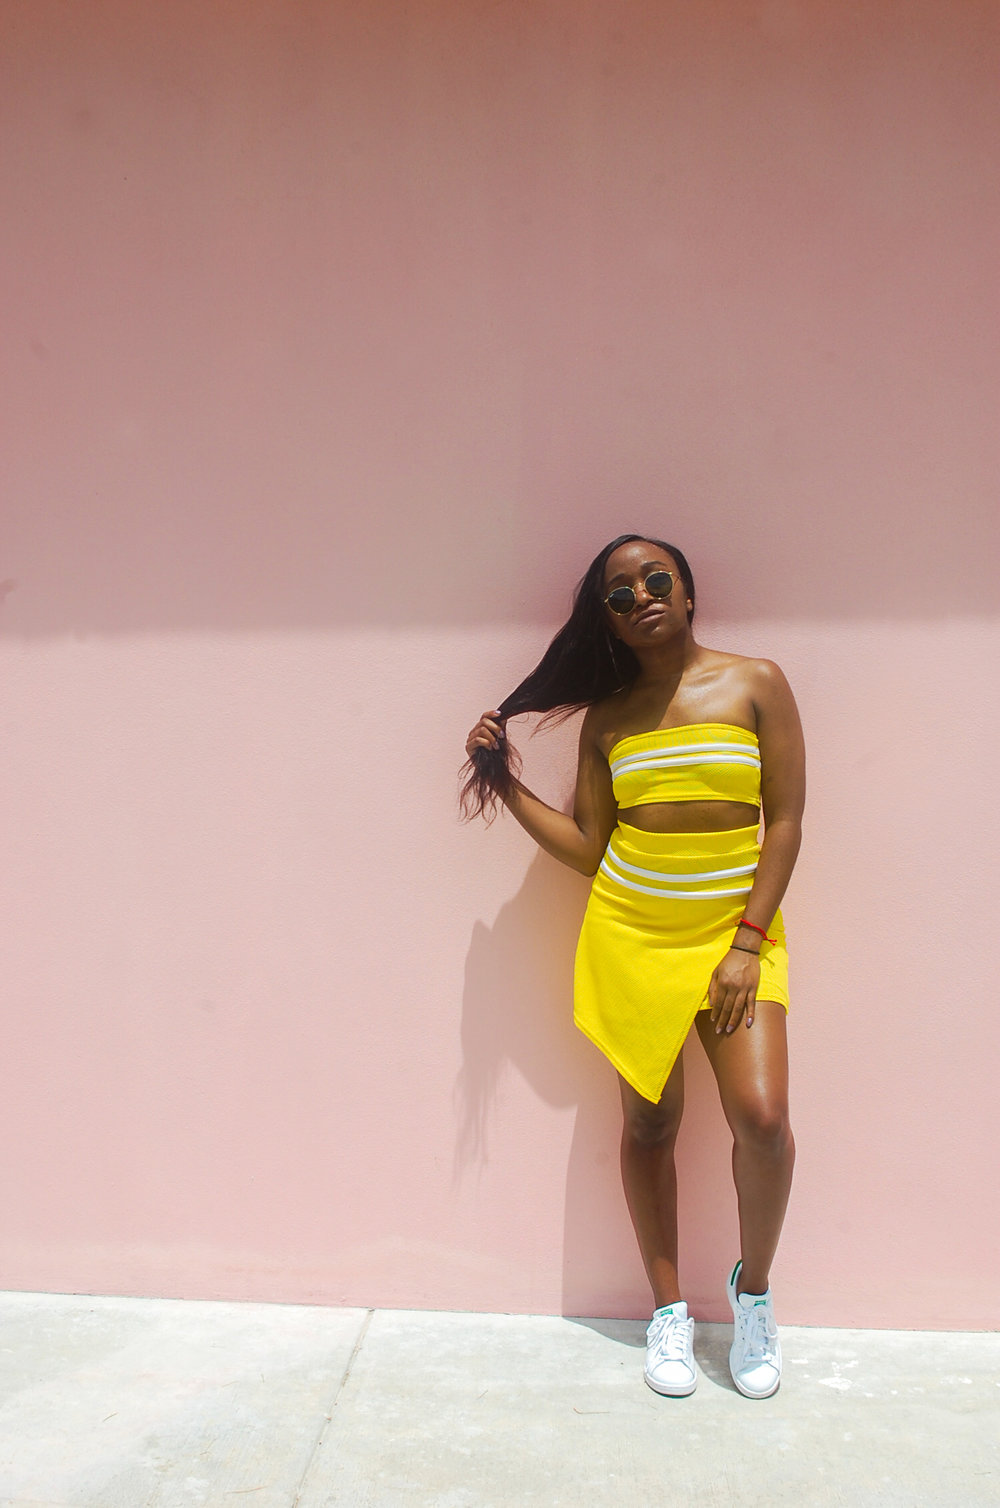 THE DEETS:  Zendaya Edit Sports Stripe Set -   Boohoo  ; Stan Smith Shoes -   adidas  ; Round Sunglasses -   RayBan